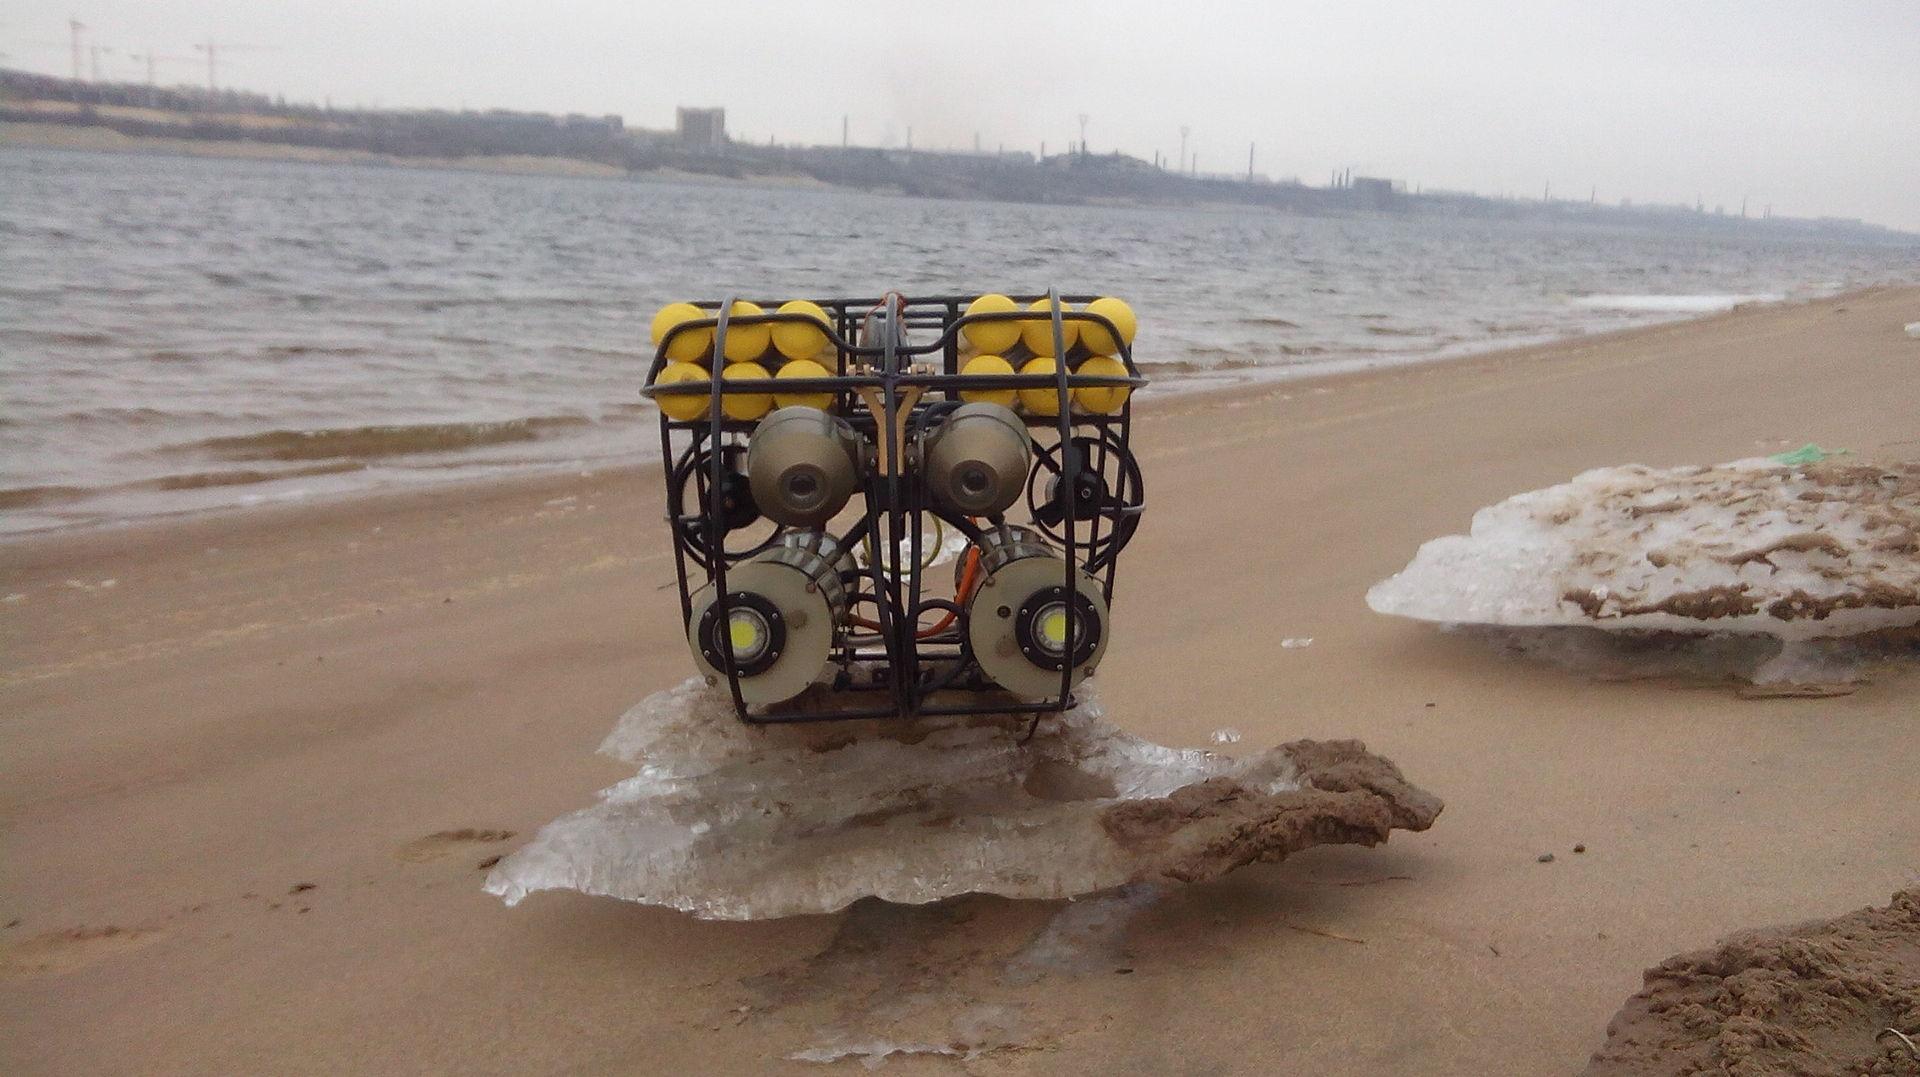 Передача видео с глубоководного робота - 2